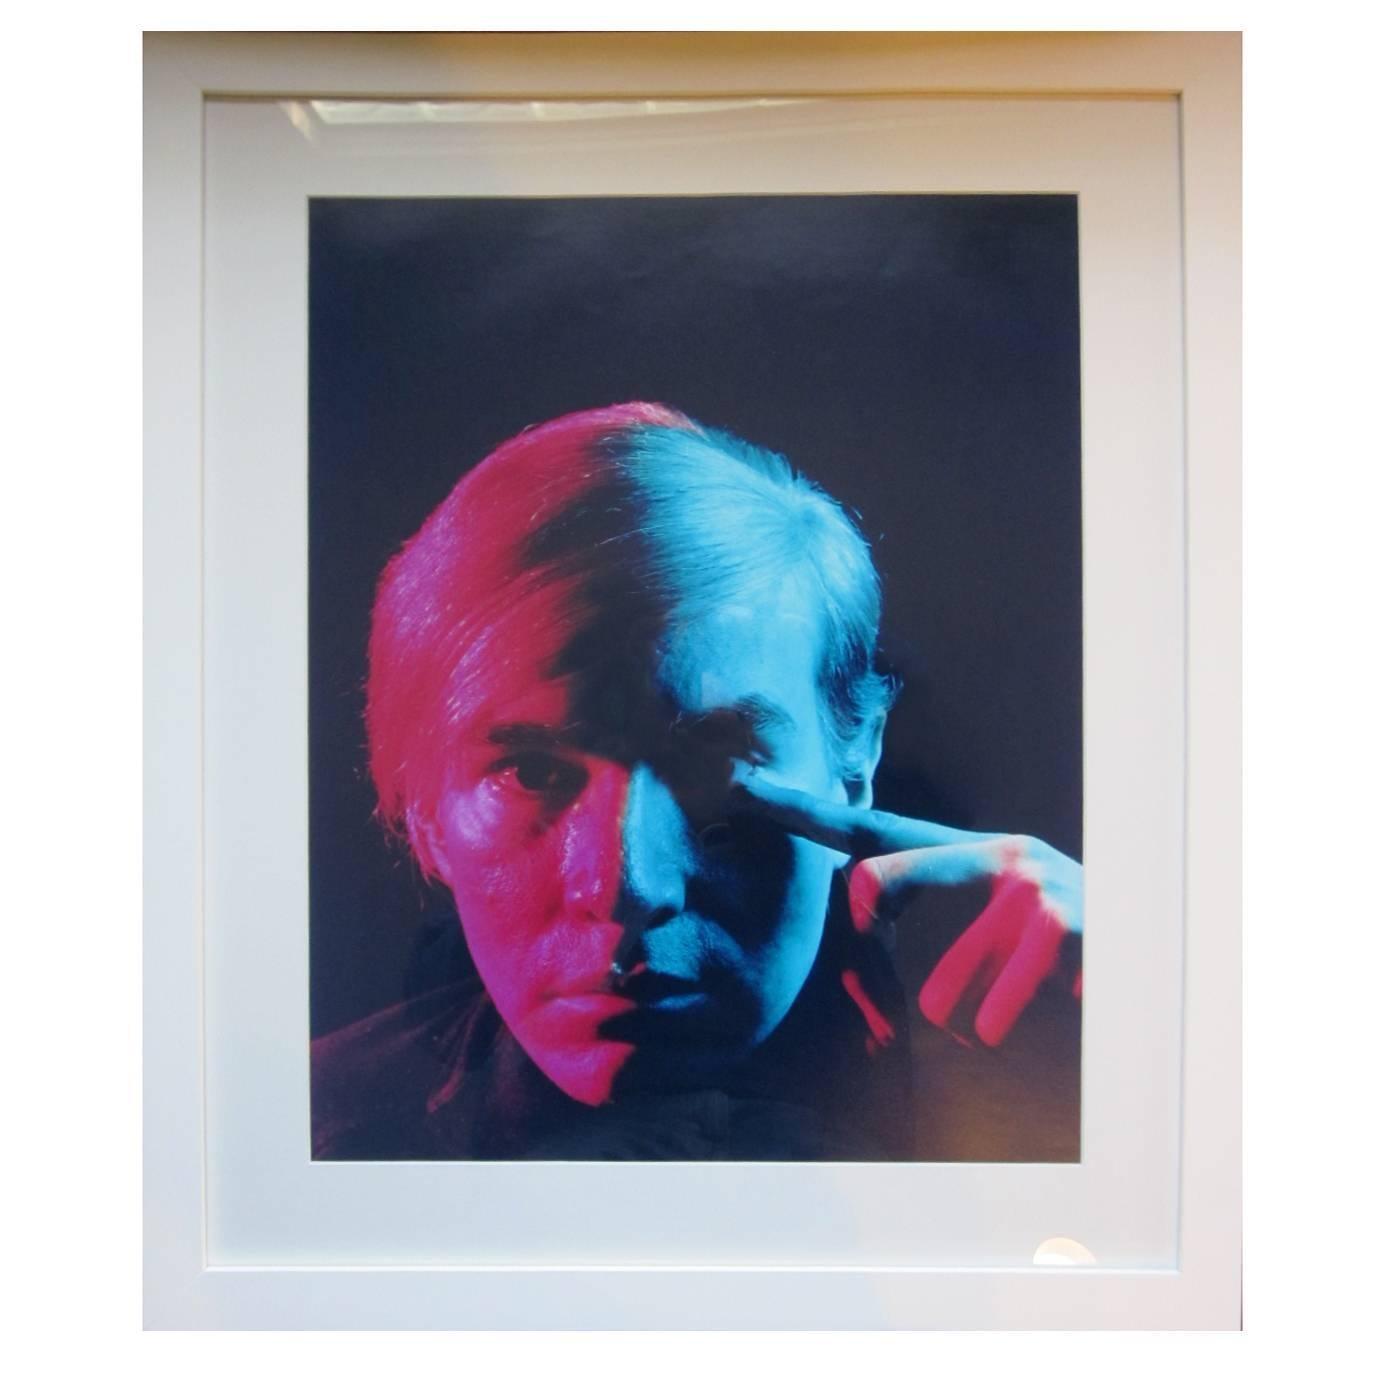 Andy Warhol 1968 Portrait by Philippe Halsman